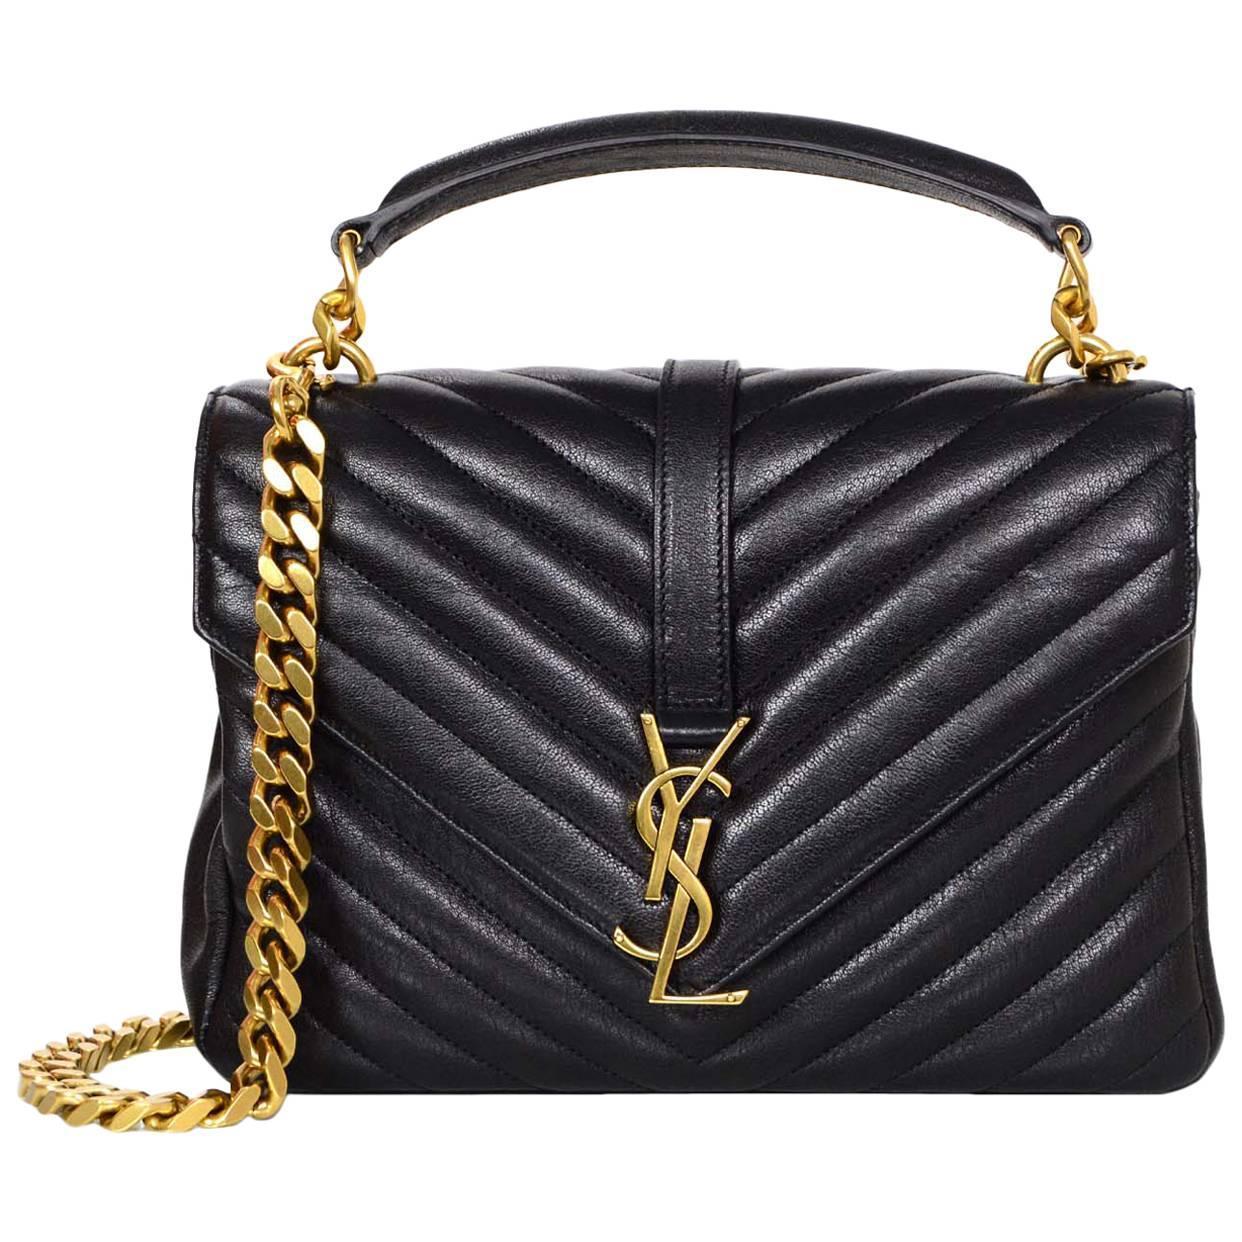 e11fc8678 Saint Laurent Black Leather Chevron Medium Monogram College Crossbody Bag  For Sale at 1stdibs